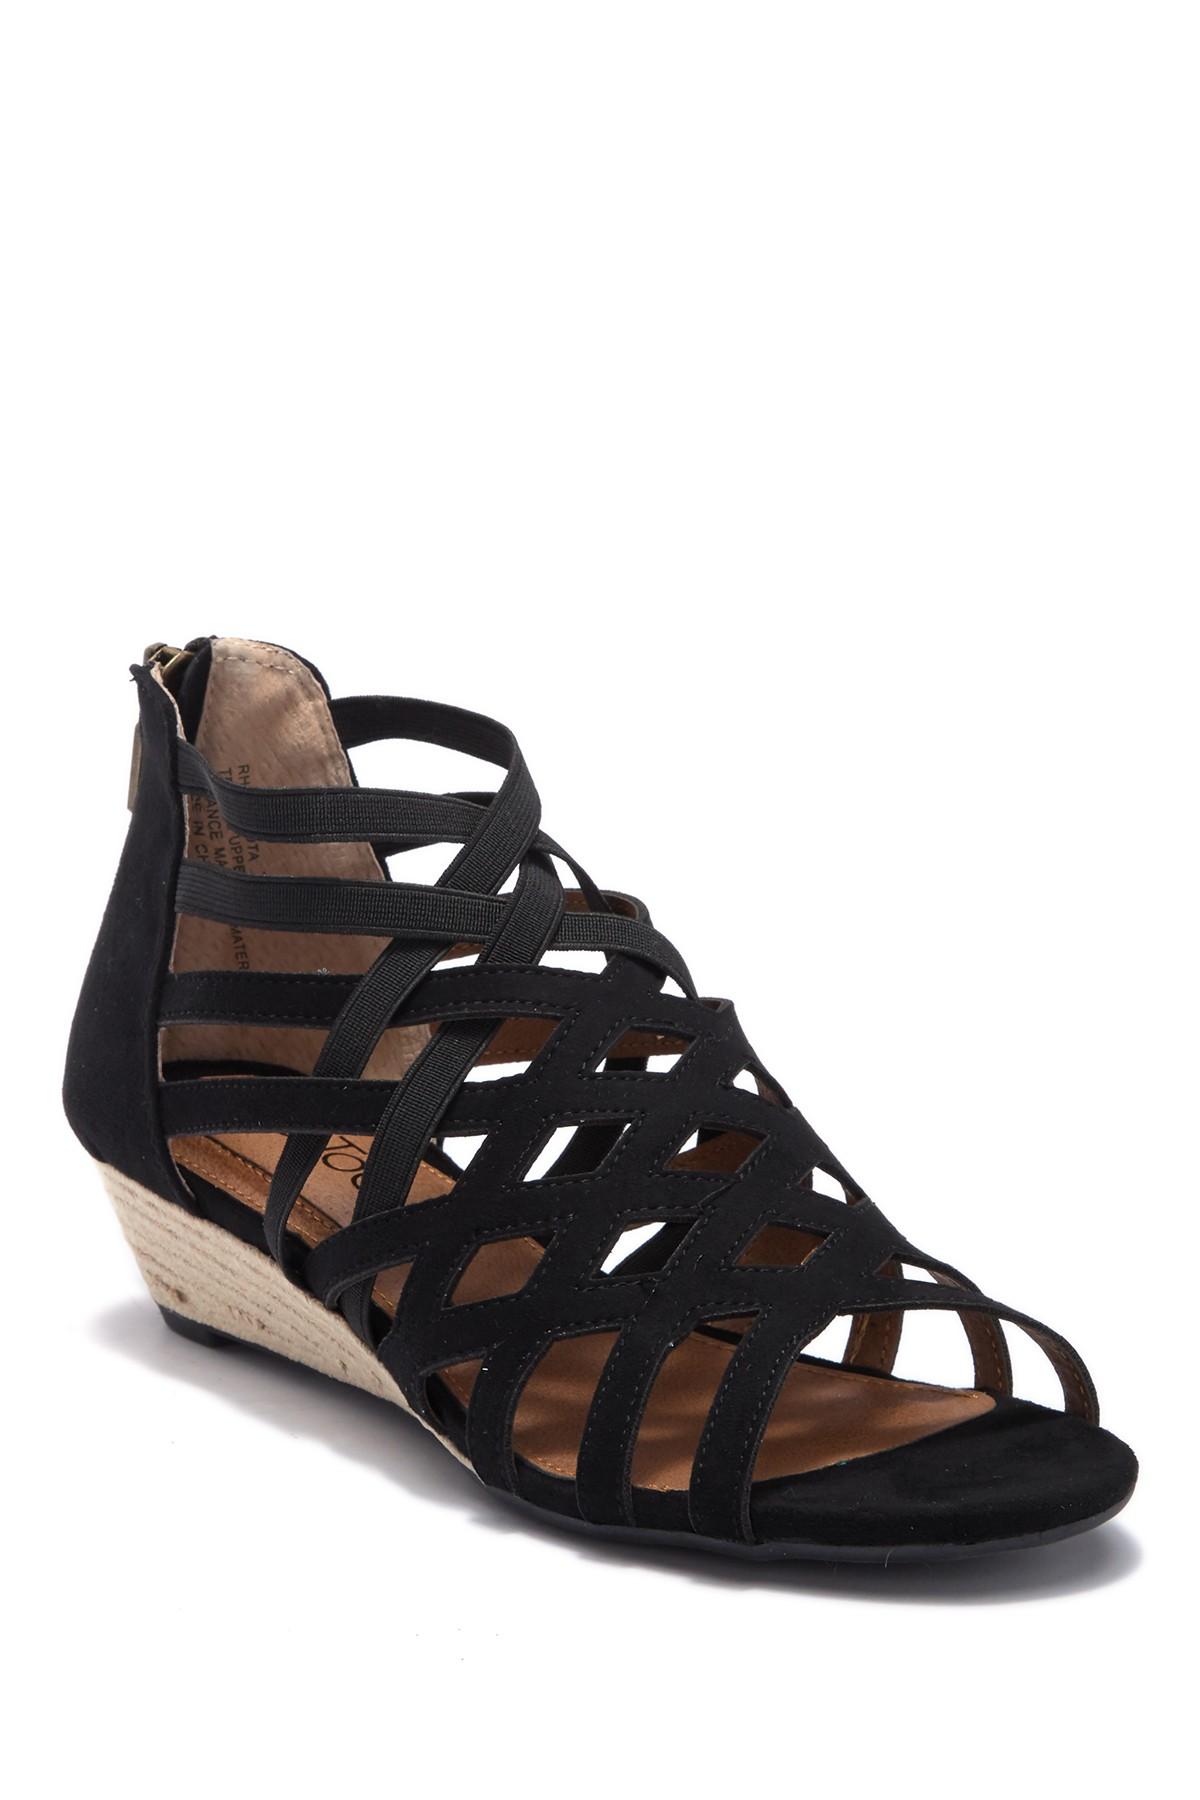 classic shoes huge inventory entire collection Me Too Mujer Carlota Lattice Sandalia Gladiador Negro Gamuza | eBay